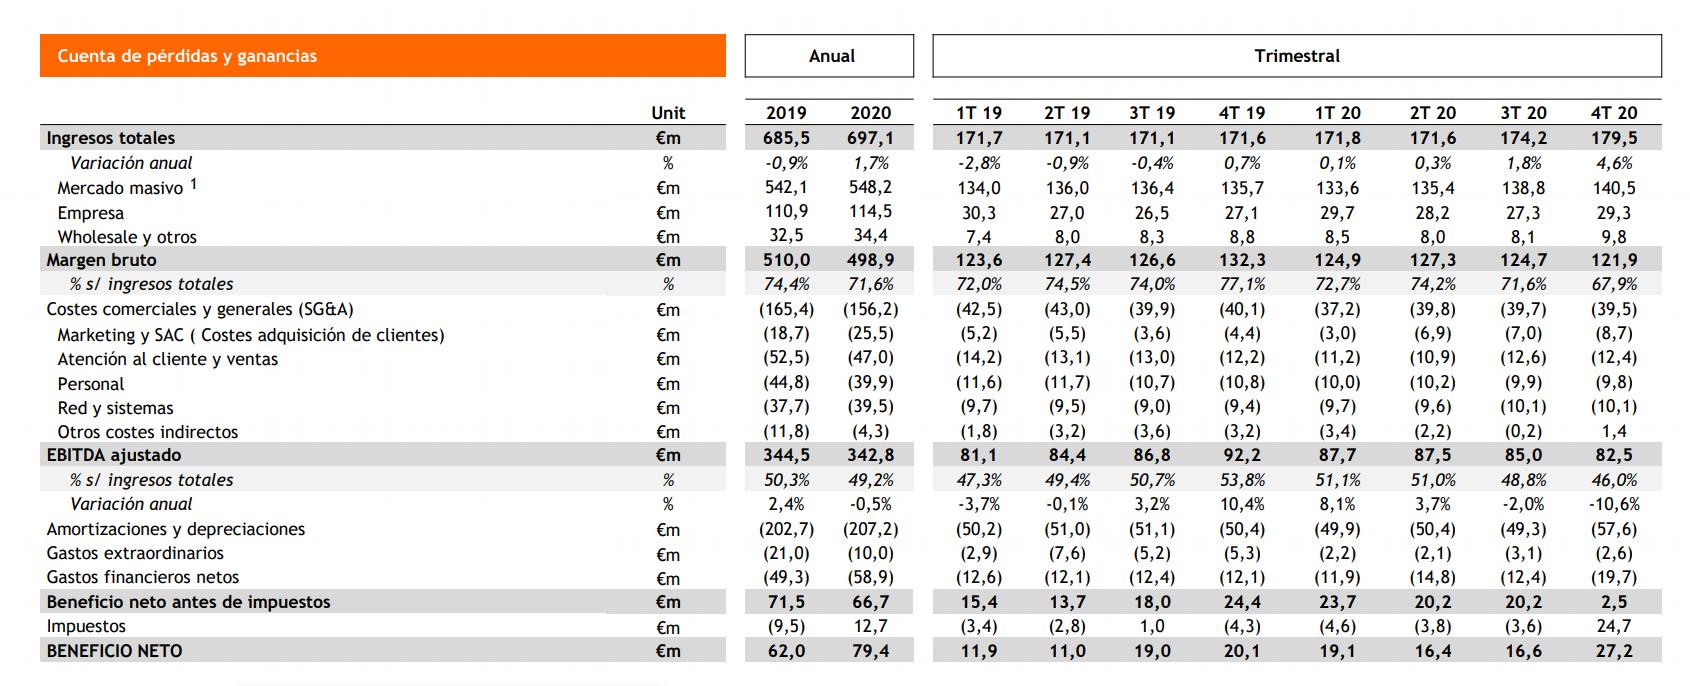 Resultados Grupo Euskaltel 2020.